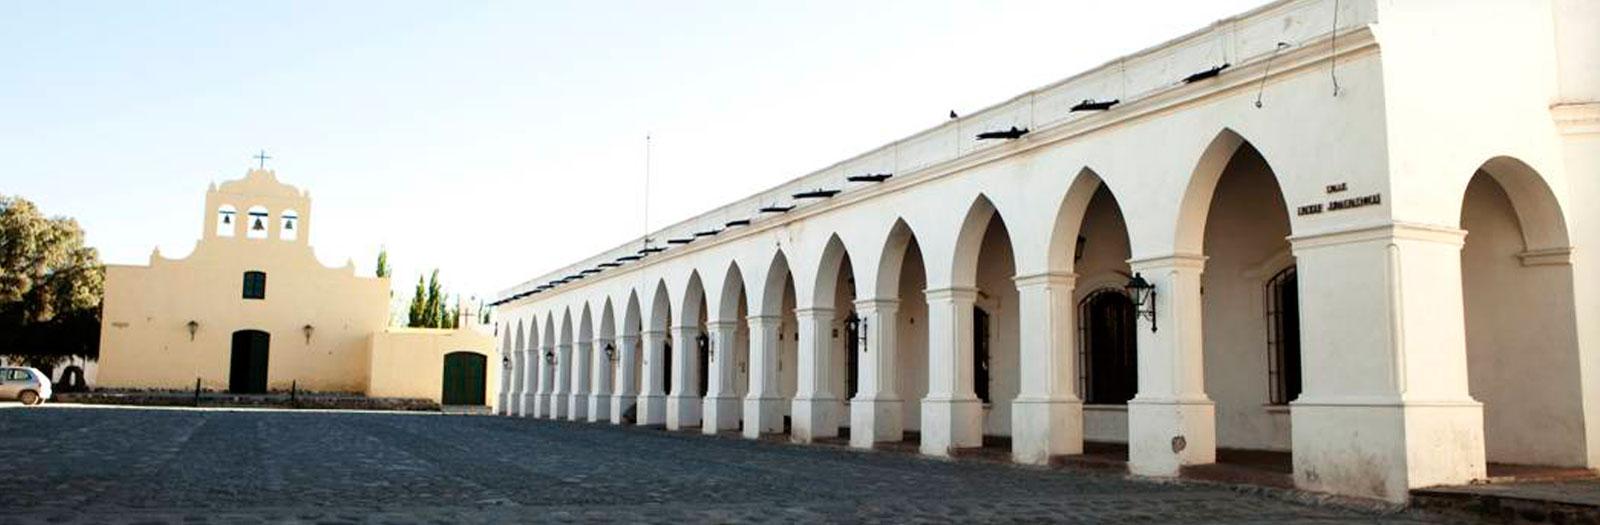 Museo de Cachi, Salta. Por Rubén Japas (gentileza de turismo.salta.gov.ar)